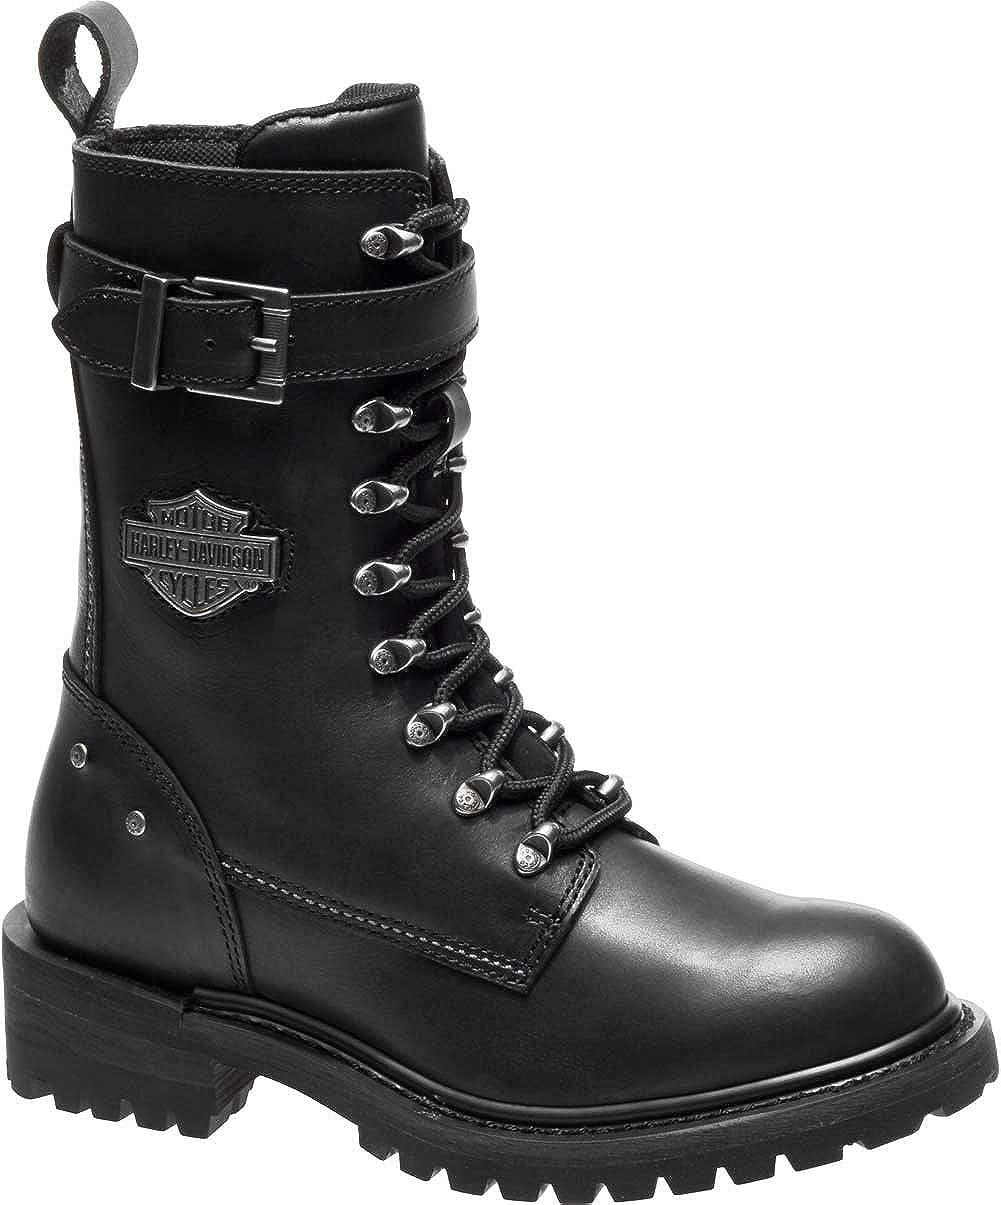 645626b1c9df Amazon.com  Harley-Davidson Women s Calvert 8-Inch Motorcycle Boots D87153   Harley-Davidson  Clothing